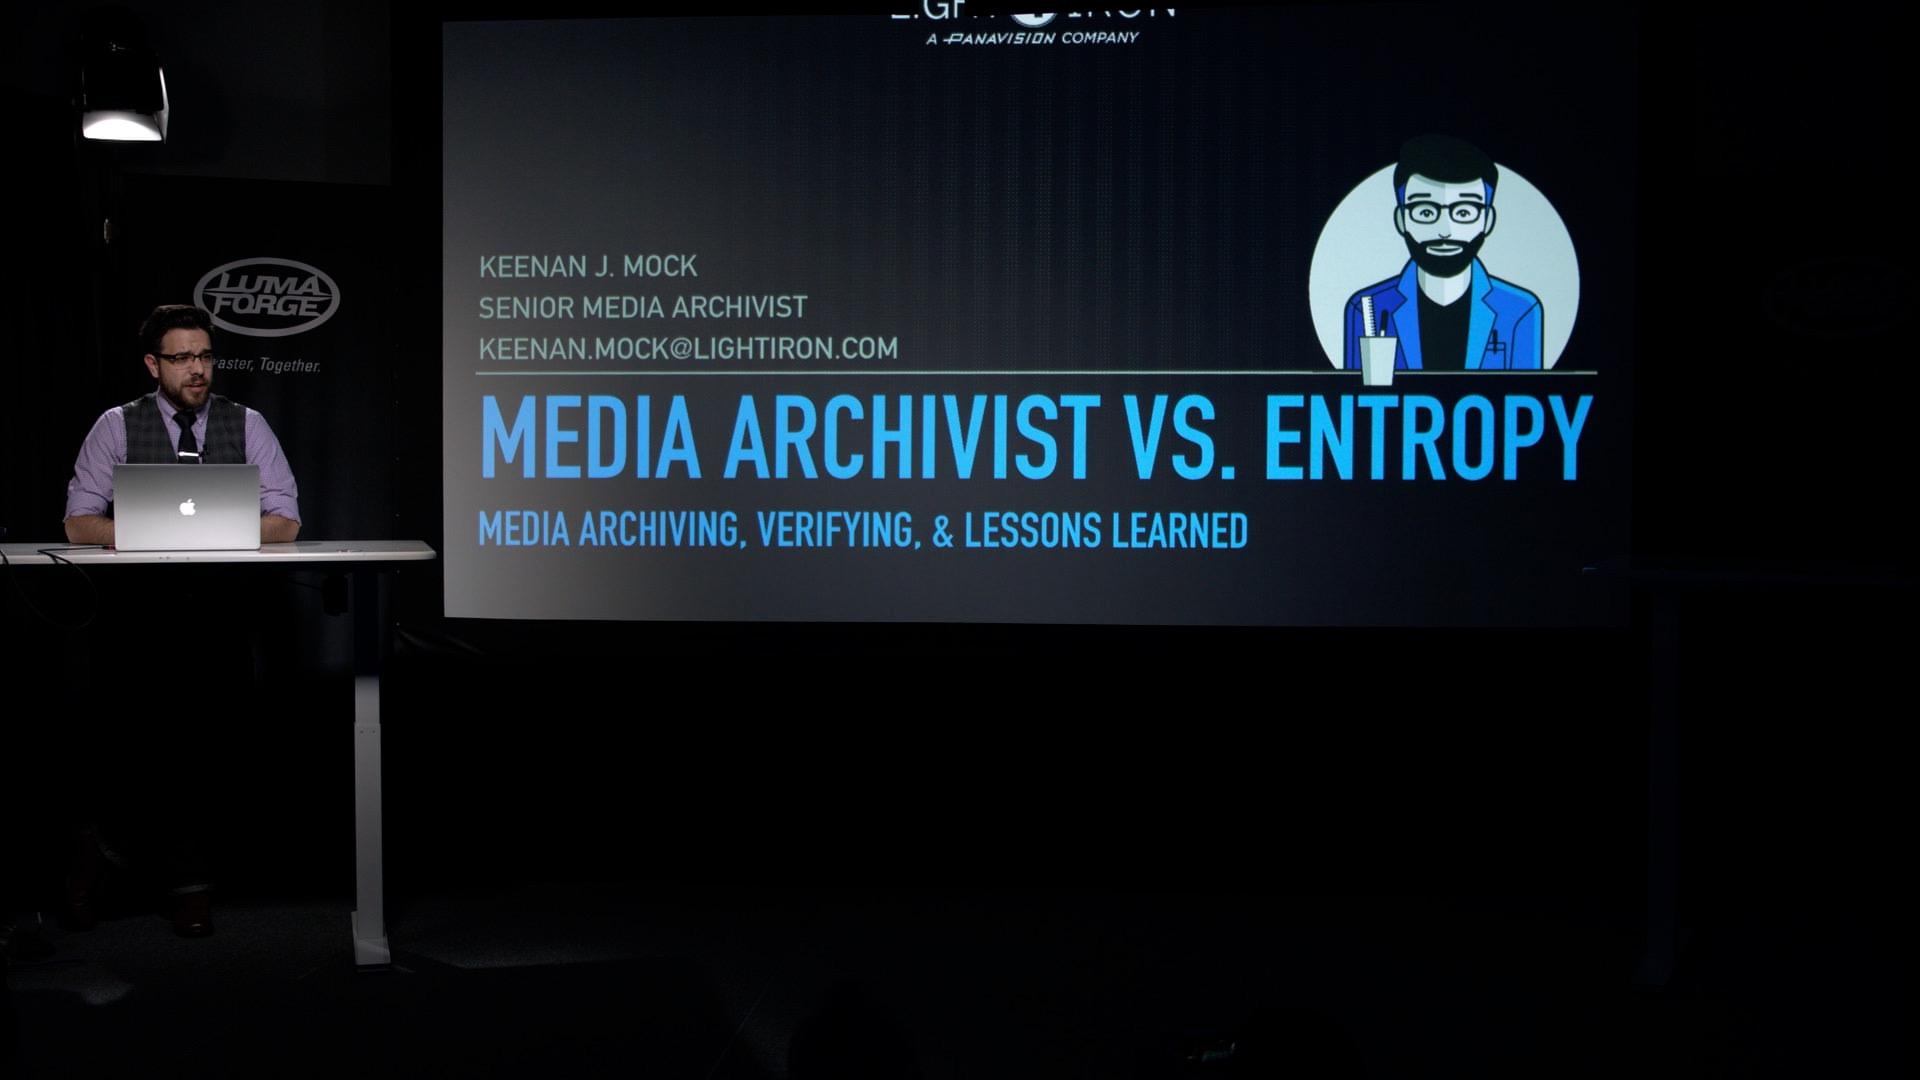 Keenan J. Mock - Media Archiving